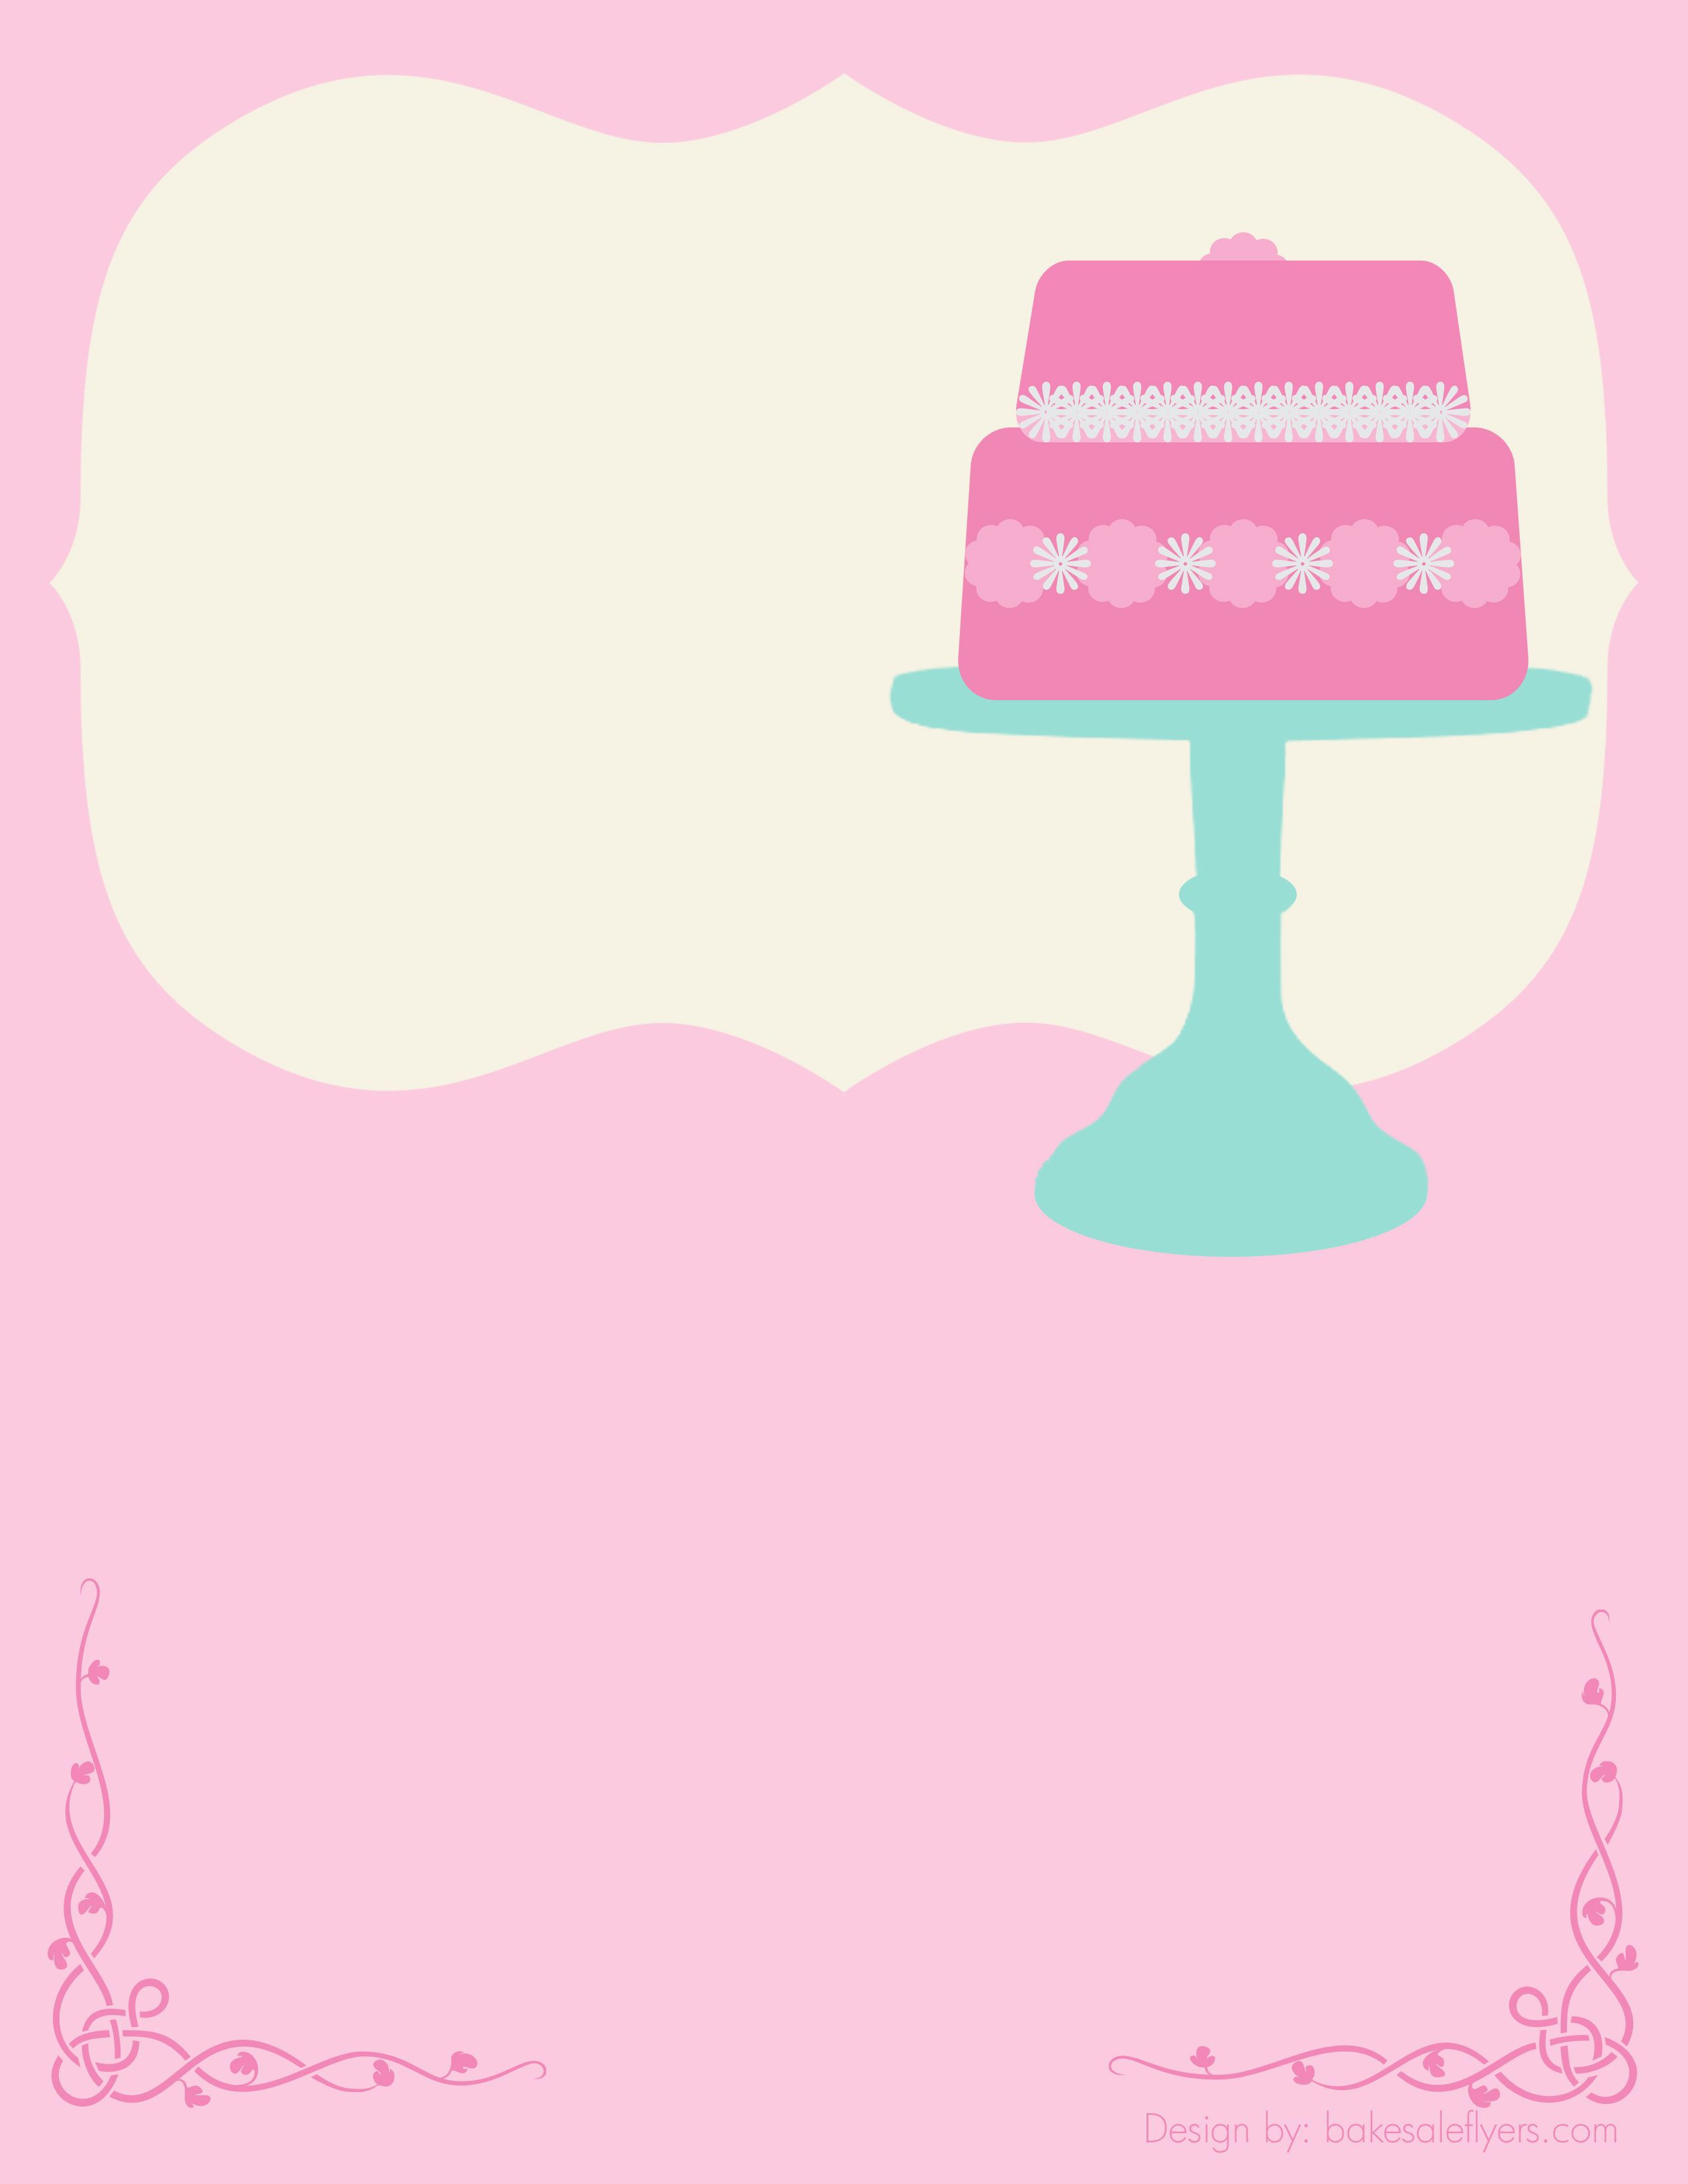 002 Remarkable Valentine Bake Sale Flyer Template Free Sample  Valentine'Full